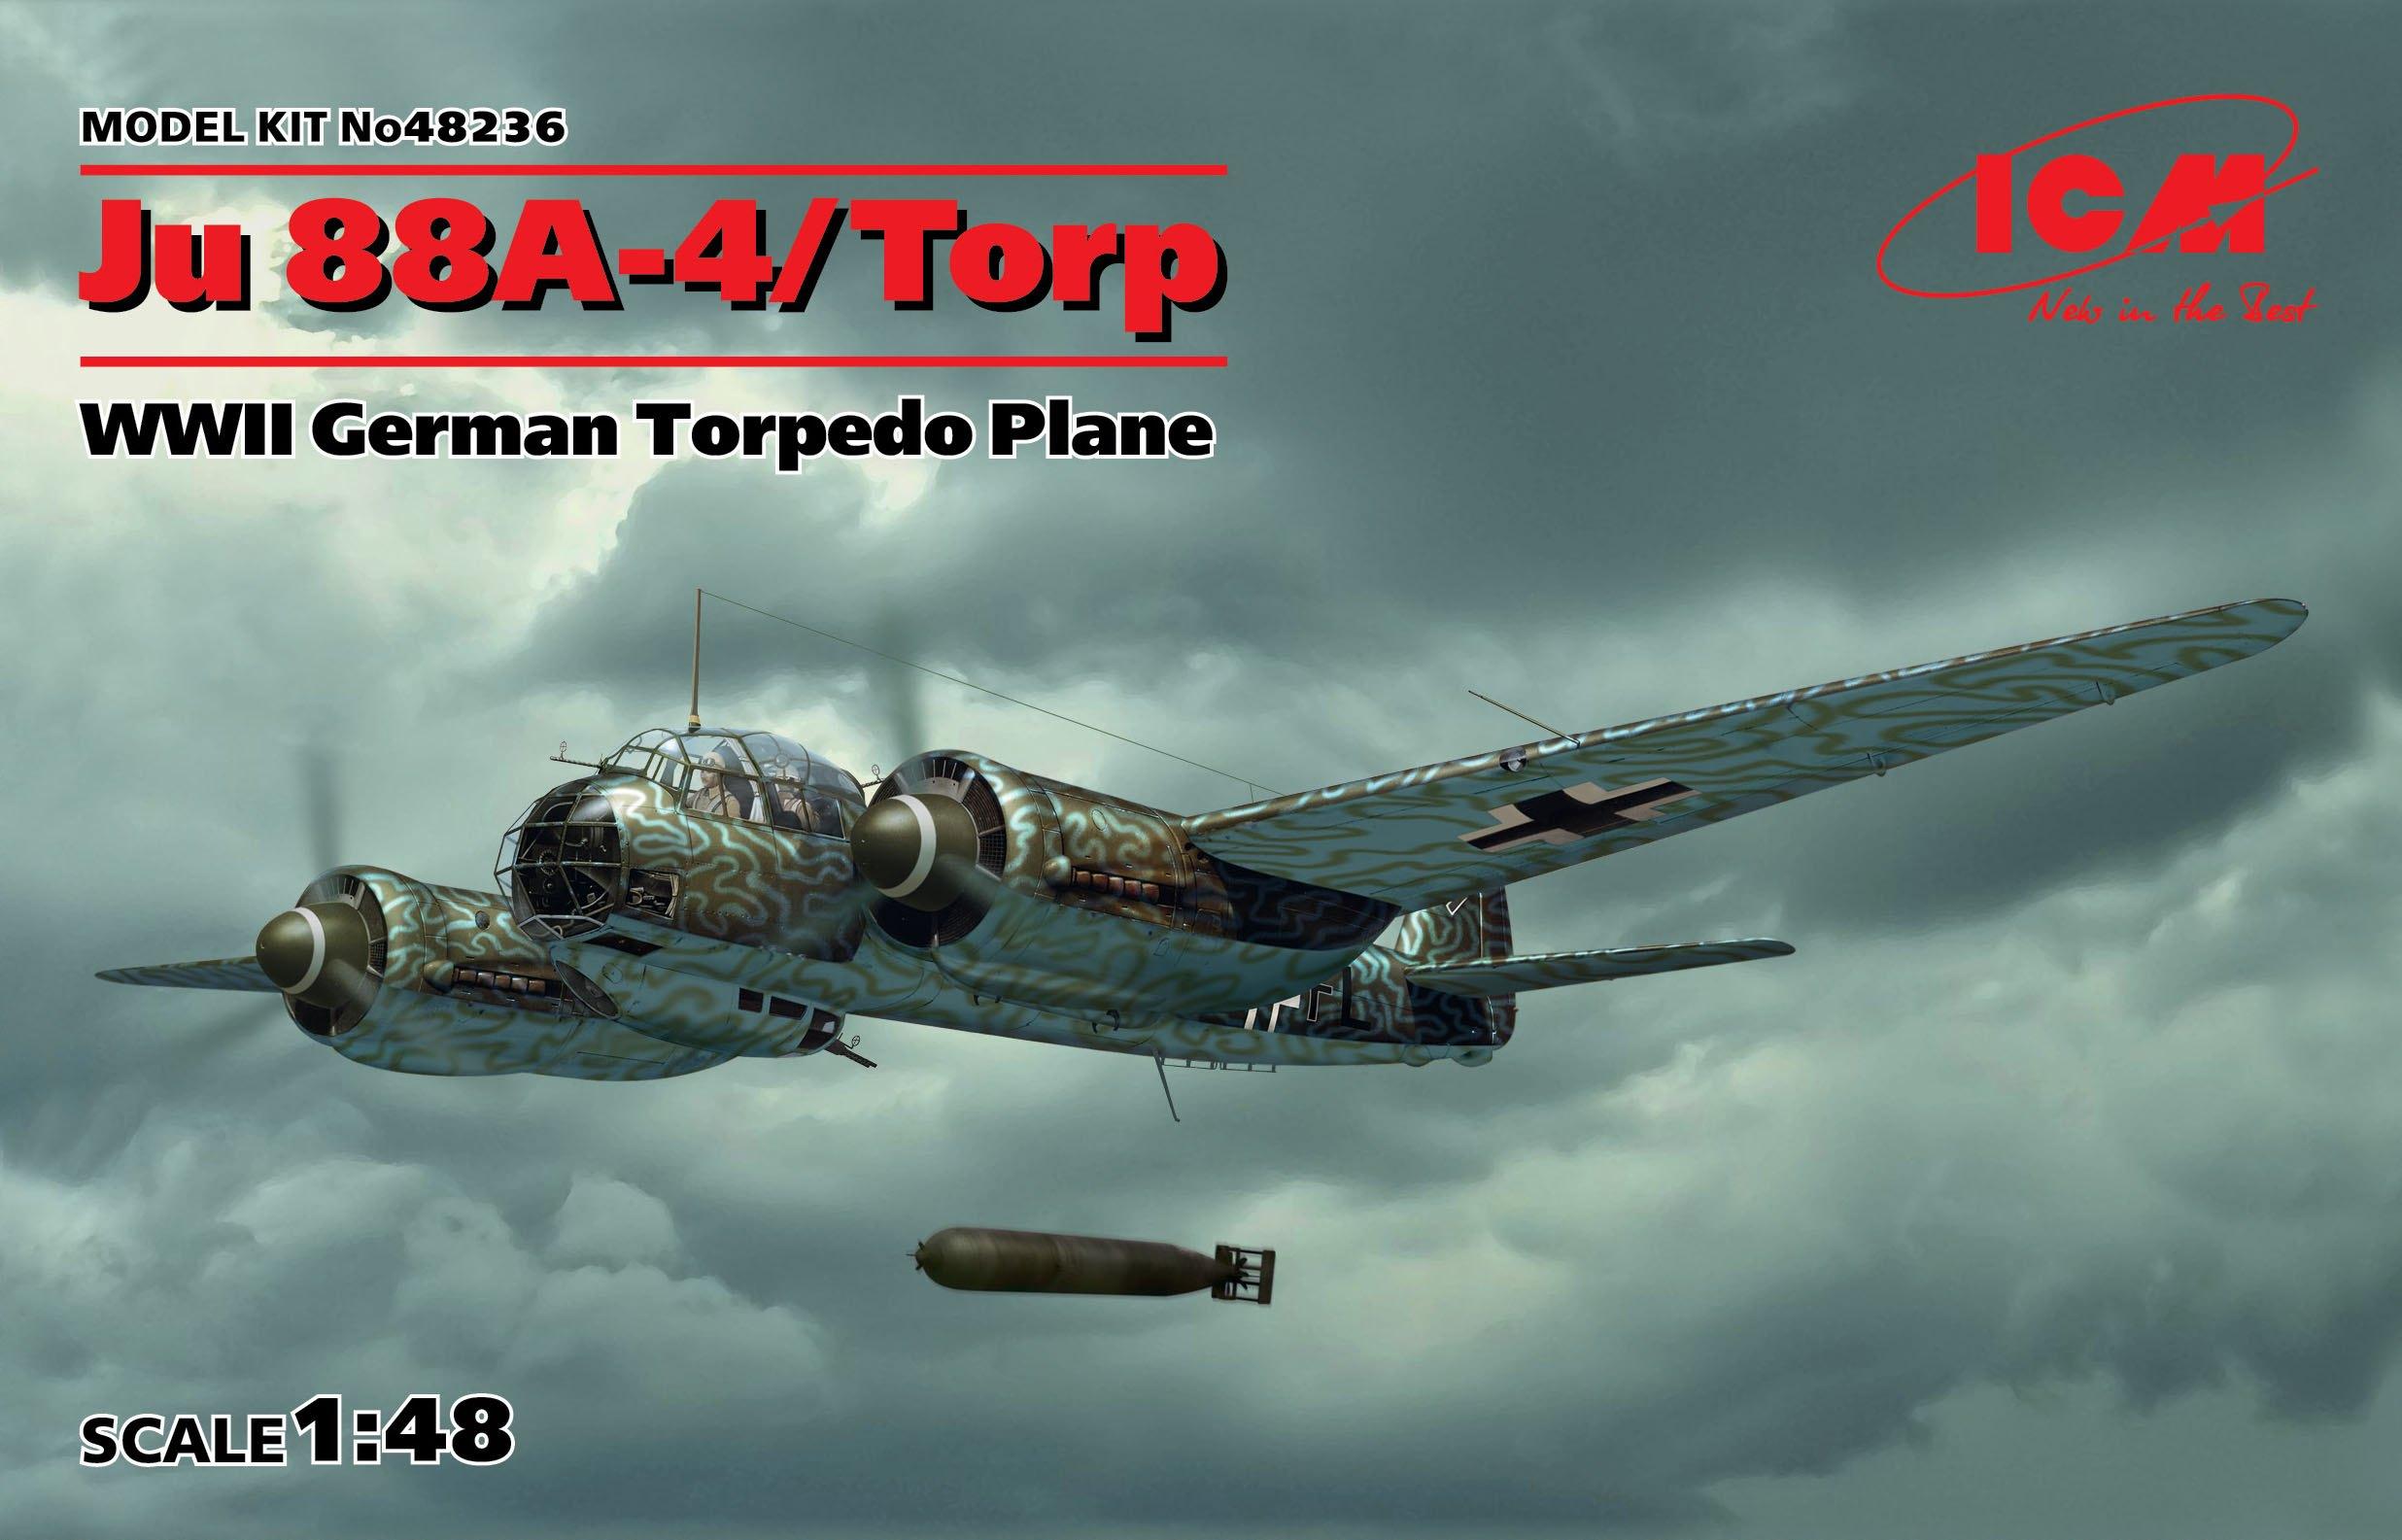 ICM Ju 88A-4 Torp/A-17, WWII German Torpedo Plane